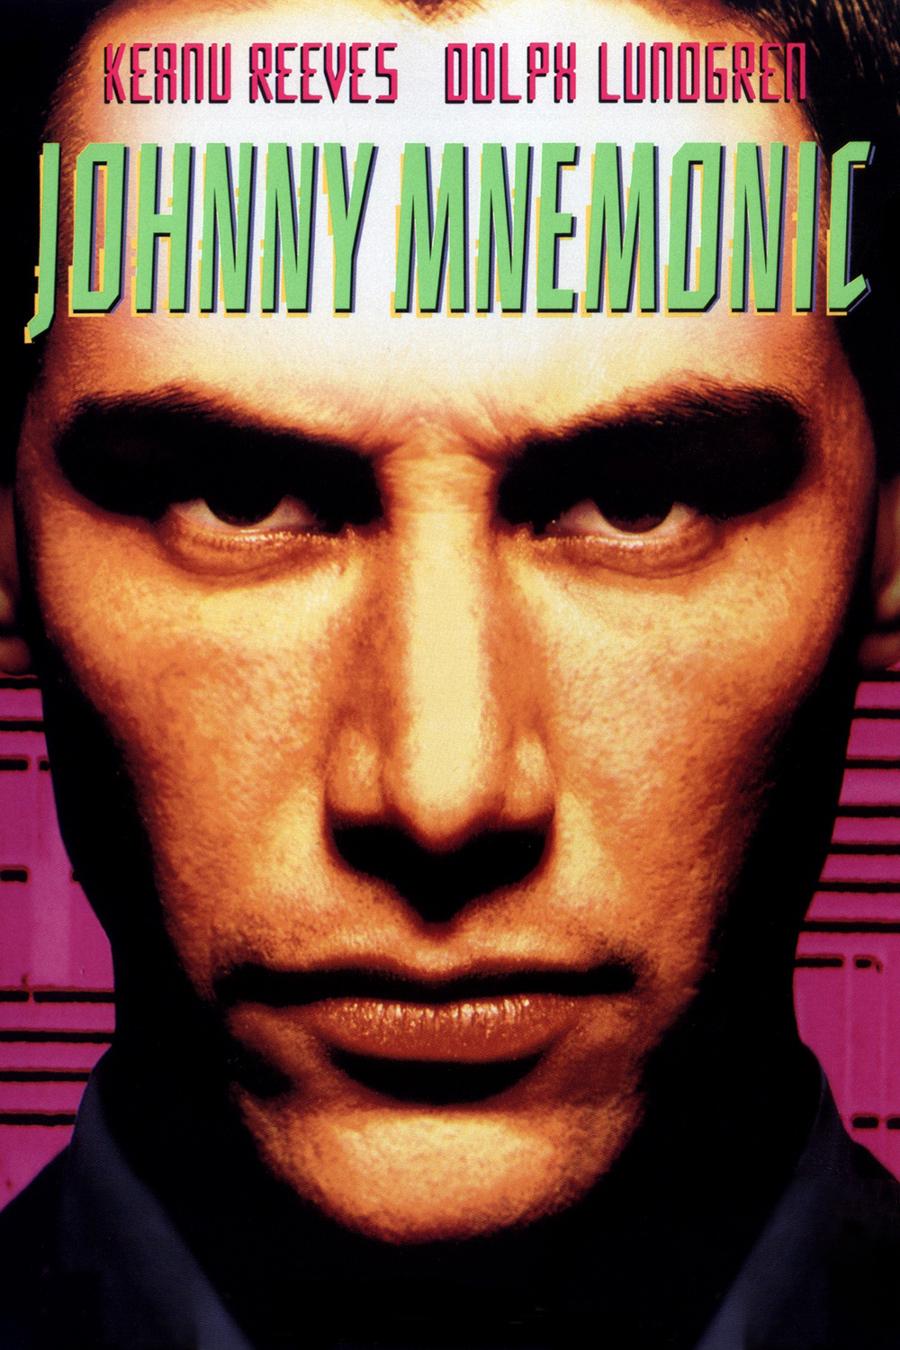 Johnny Mnemonic poster e locandina